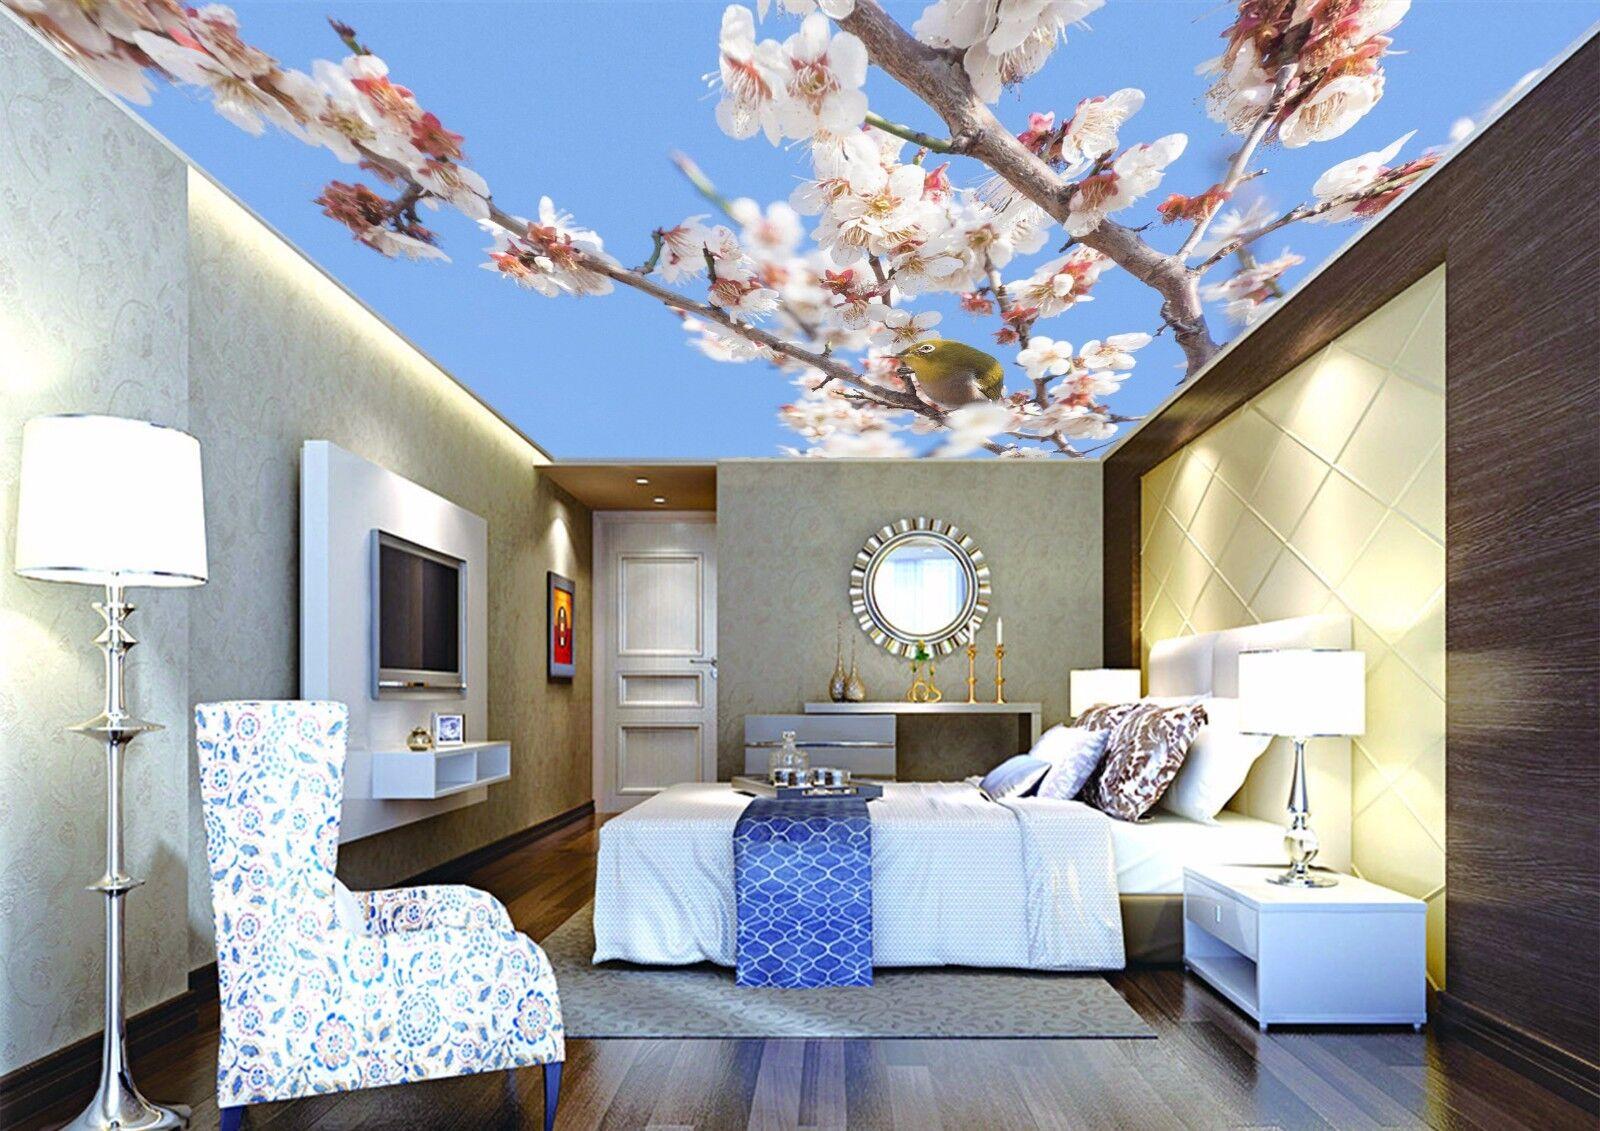 3D Blaumen Vogel 57 Fototapeten Wandbild Fototapete BildTapete DE Kyra